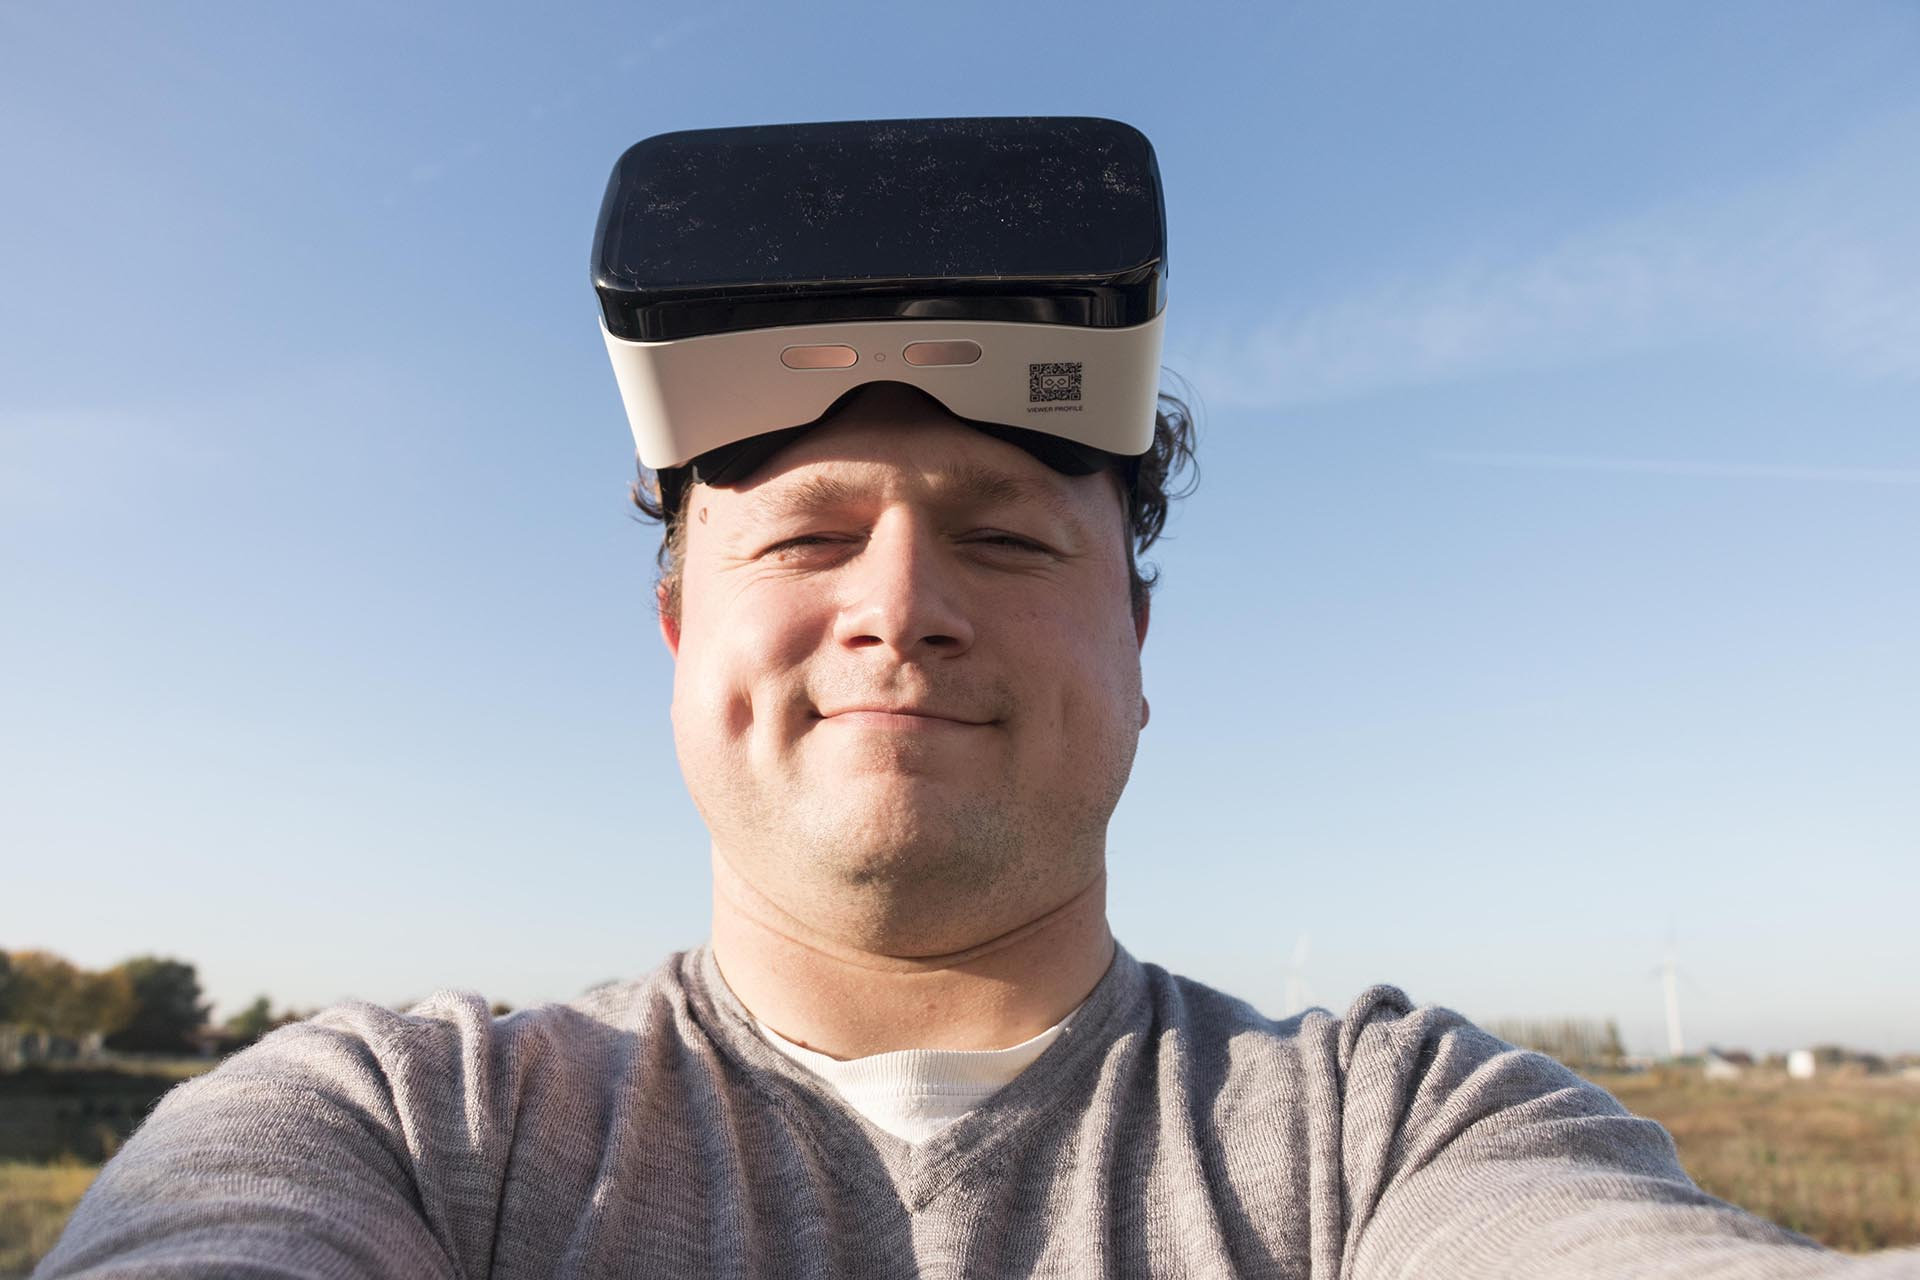 Vodafone Smart VR